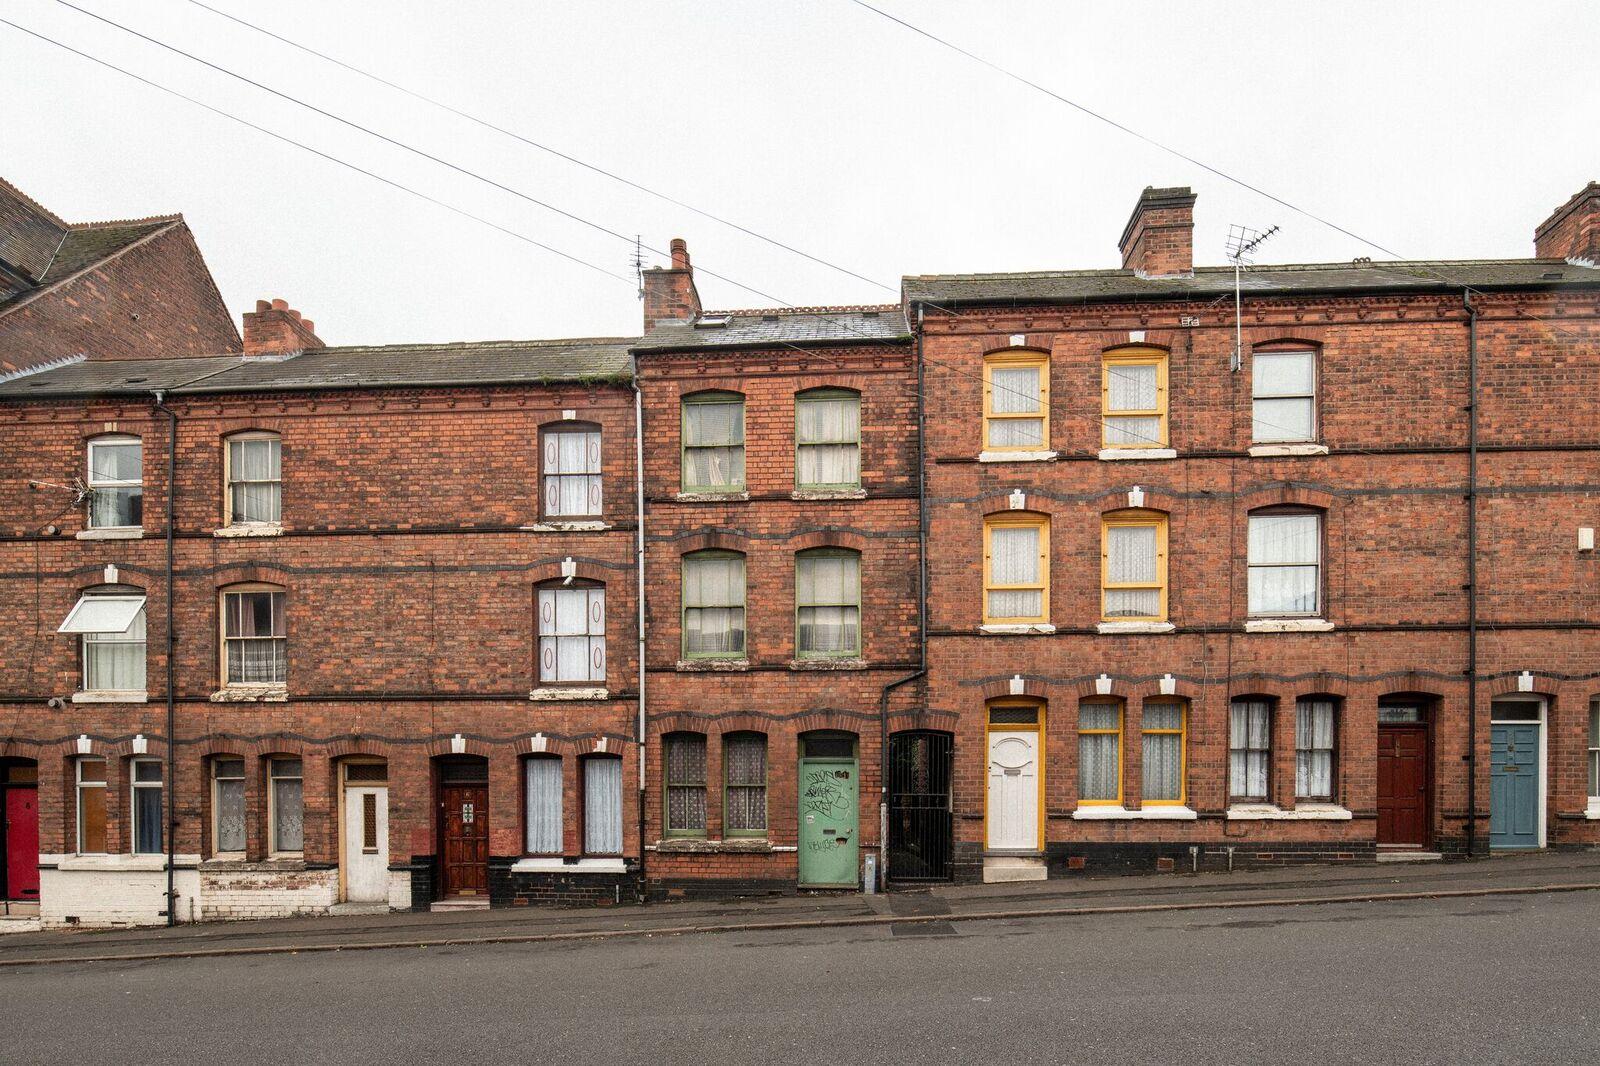 Film Birmingham wants West Midlands properties for filming locations